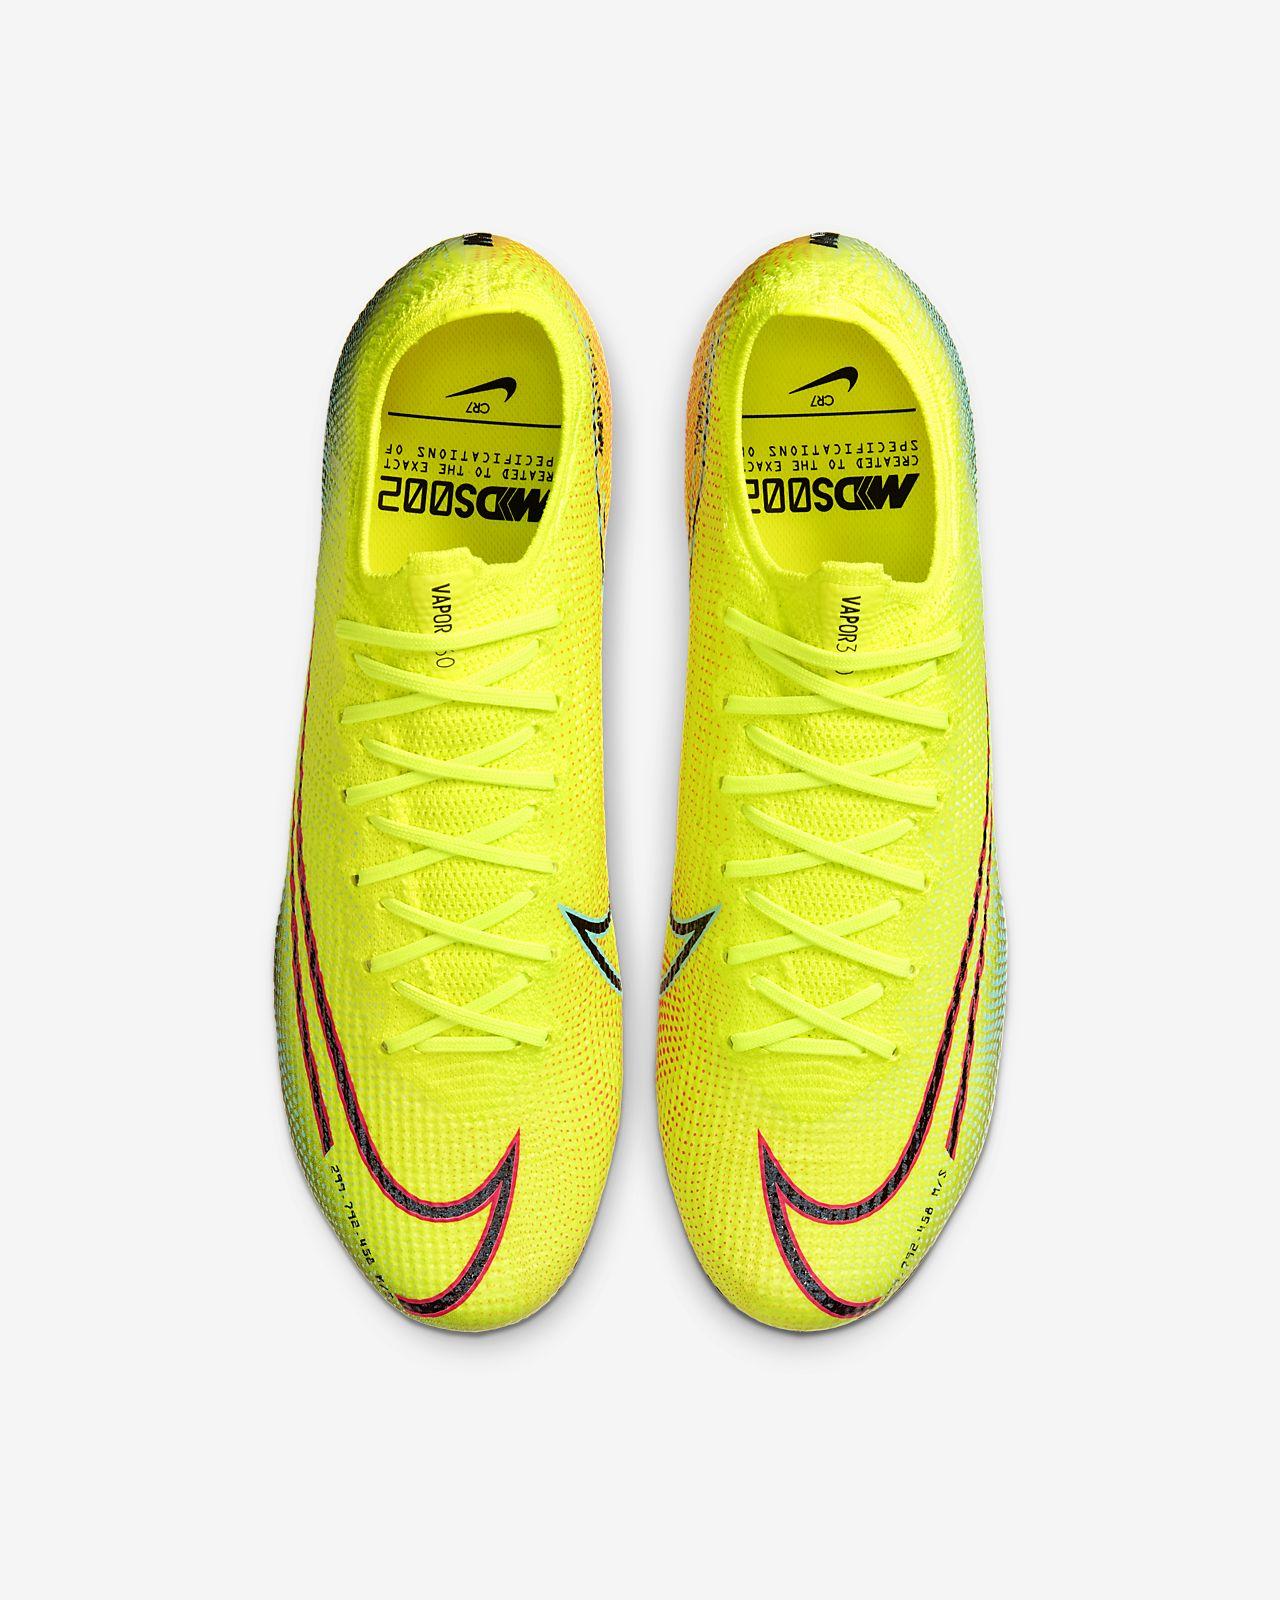 Chuteiras de futebol para terreno firme Nike Mercurial Vapor 13 Elite MDS FG